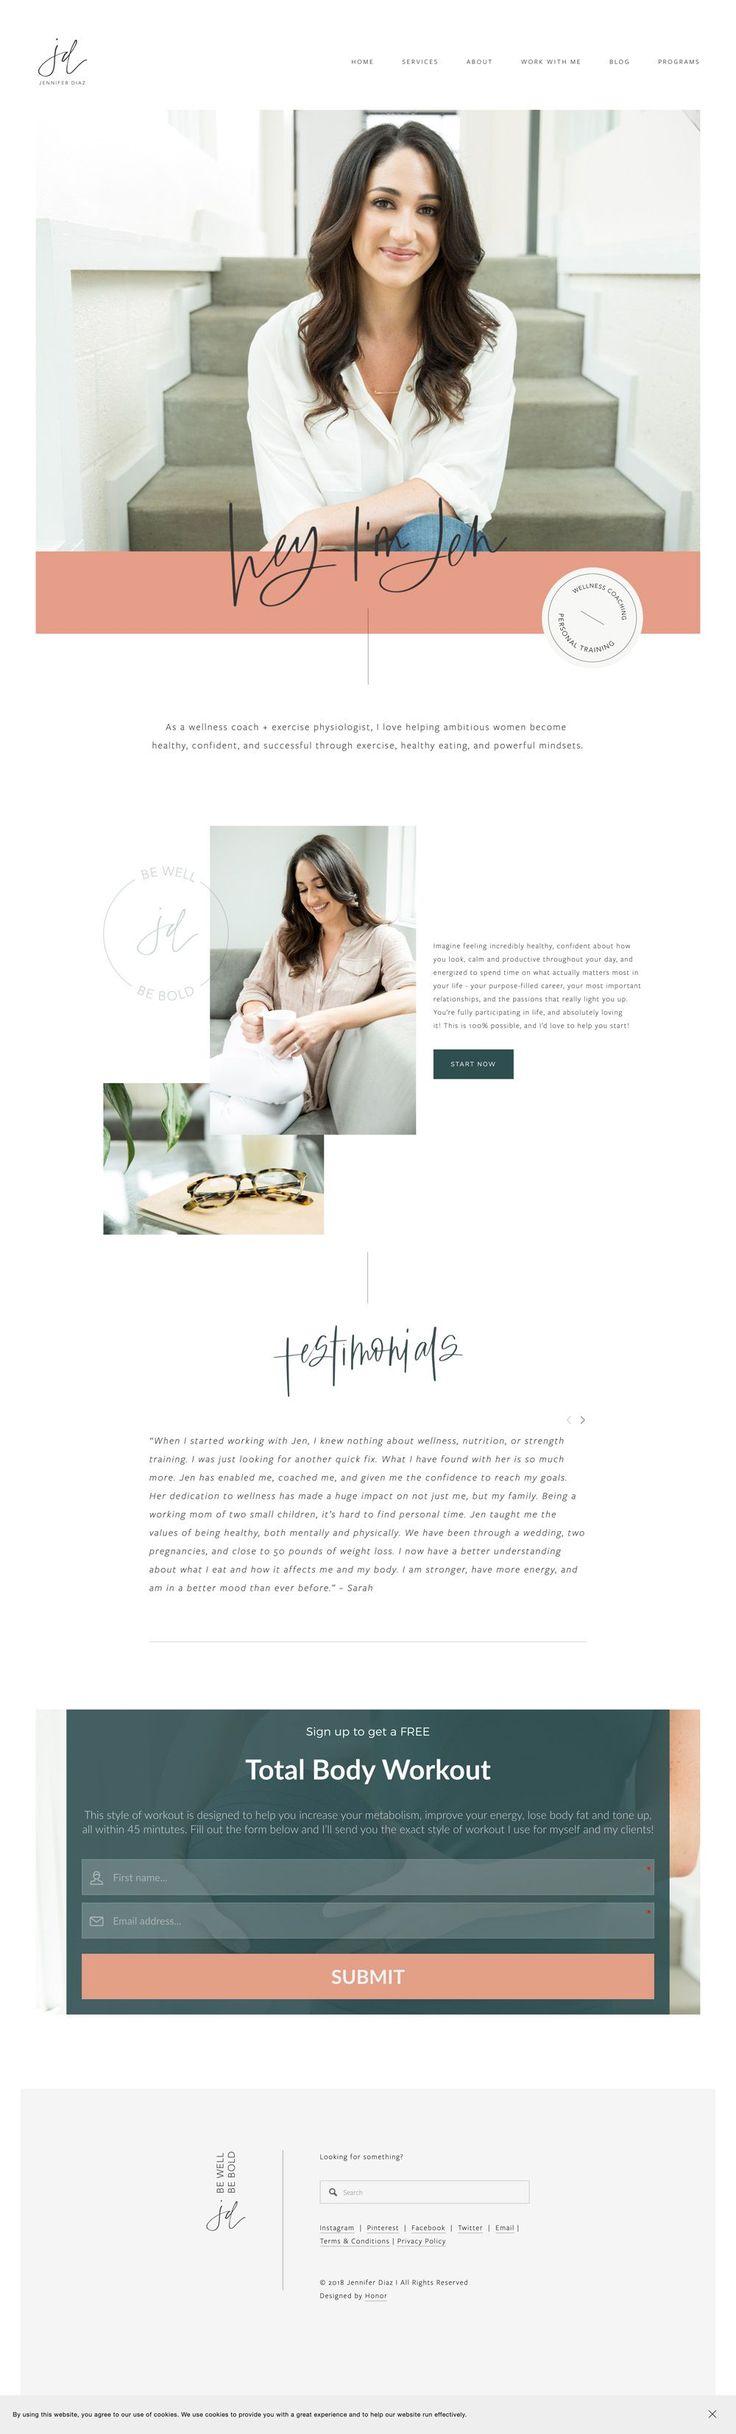 Health wellness and fitness coach website. Squarespace